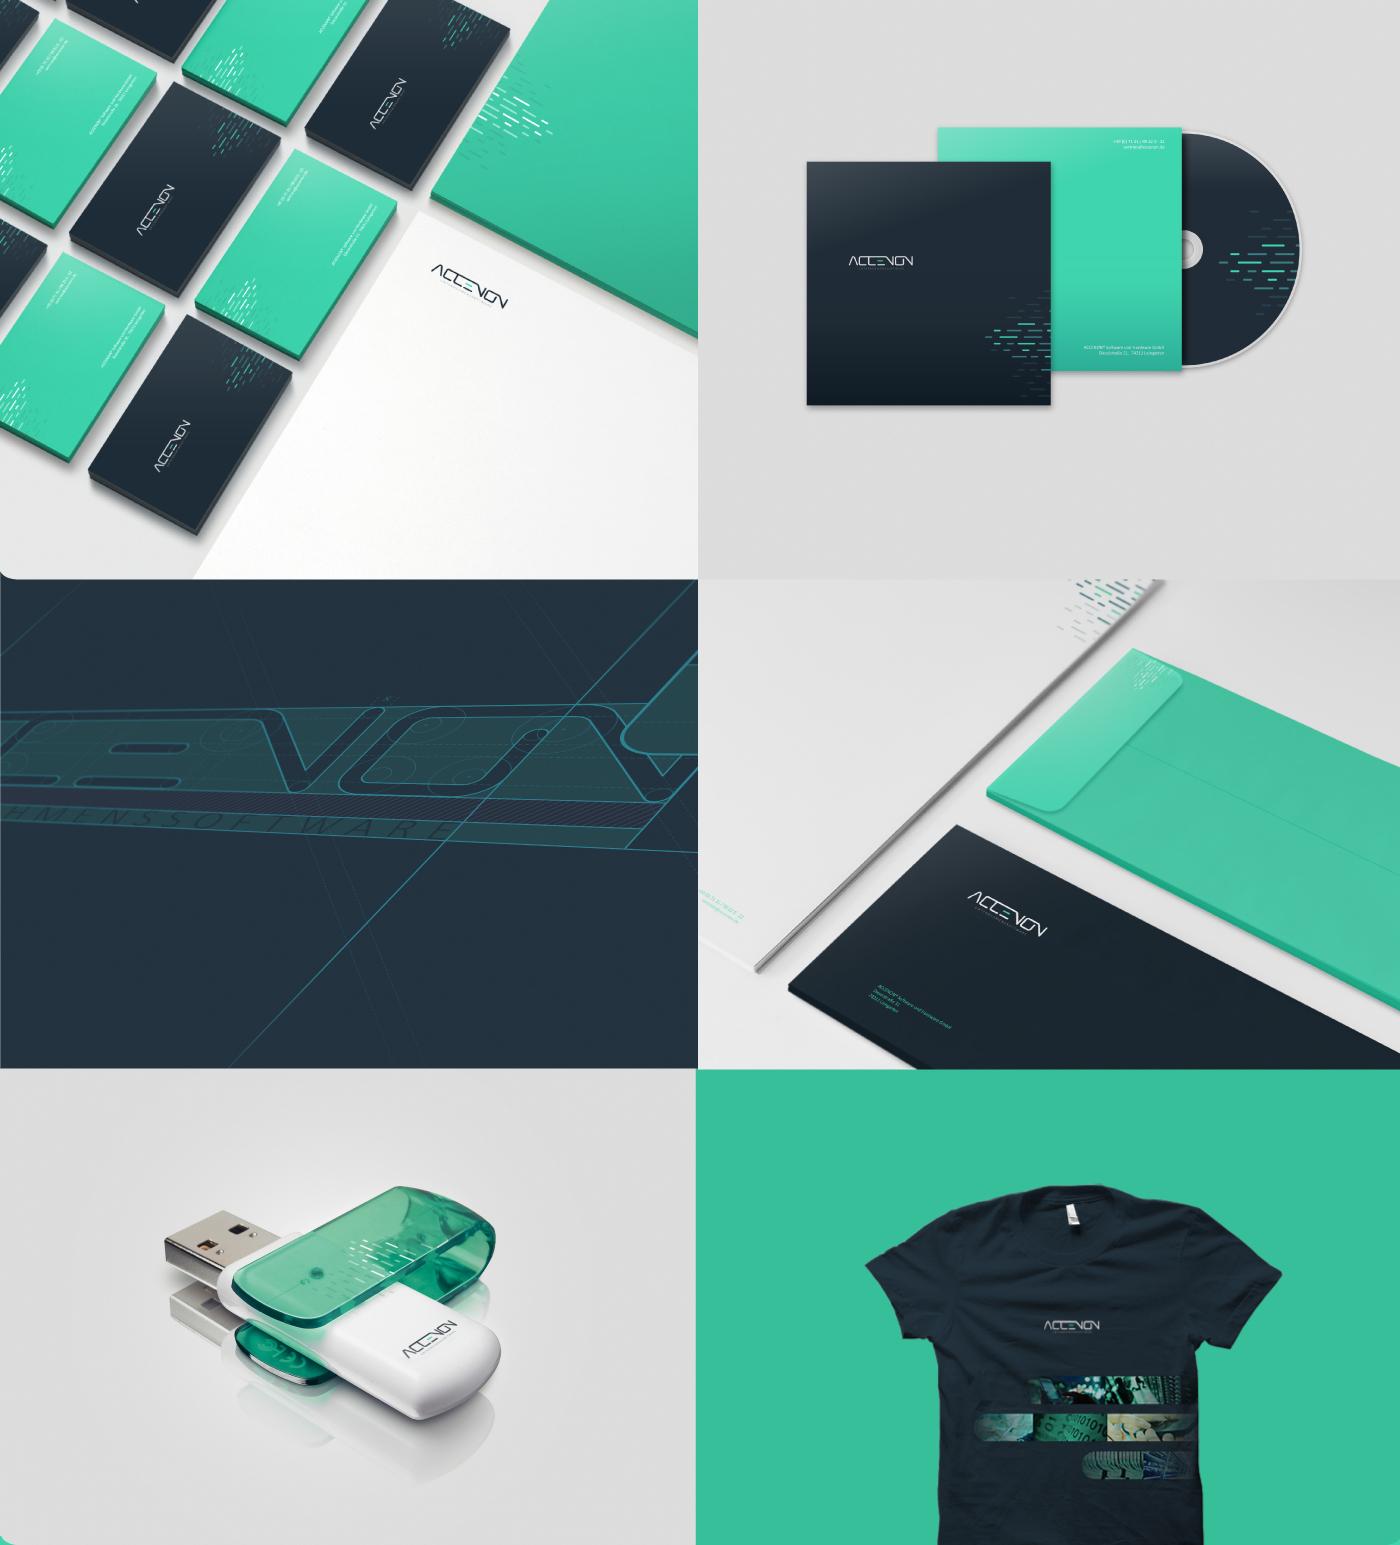 accenon,software,design,brand,logo,oven,Workshop,diego,caceres,claudia,rueda,pantone